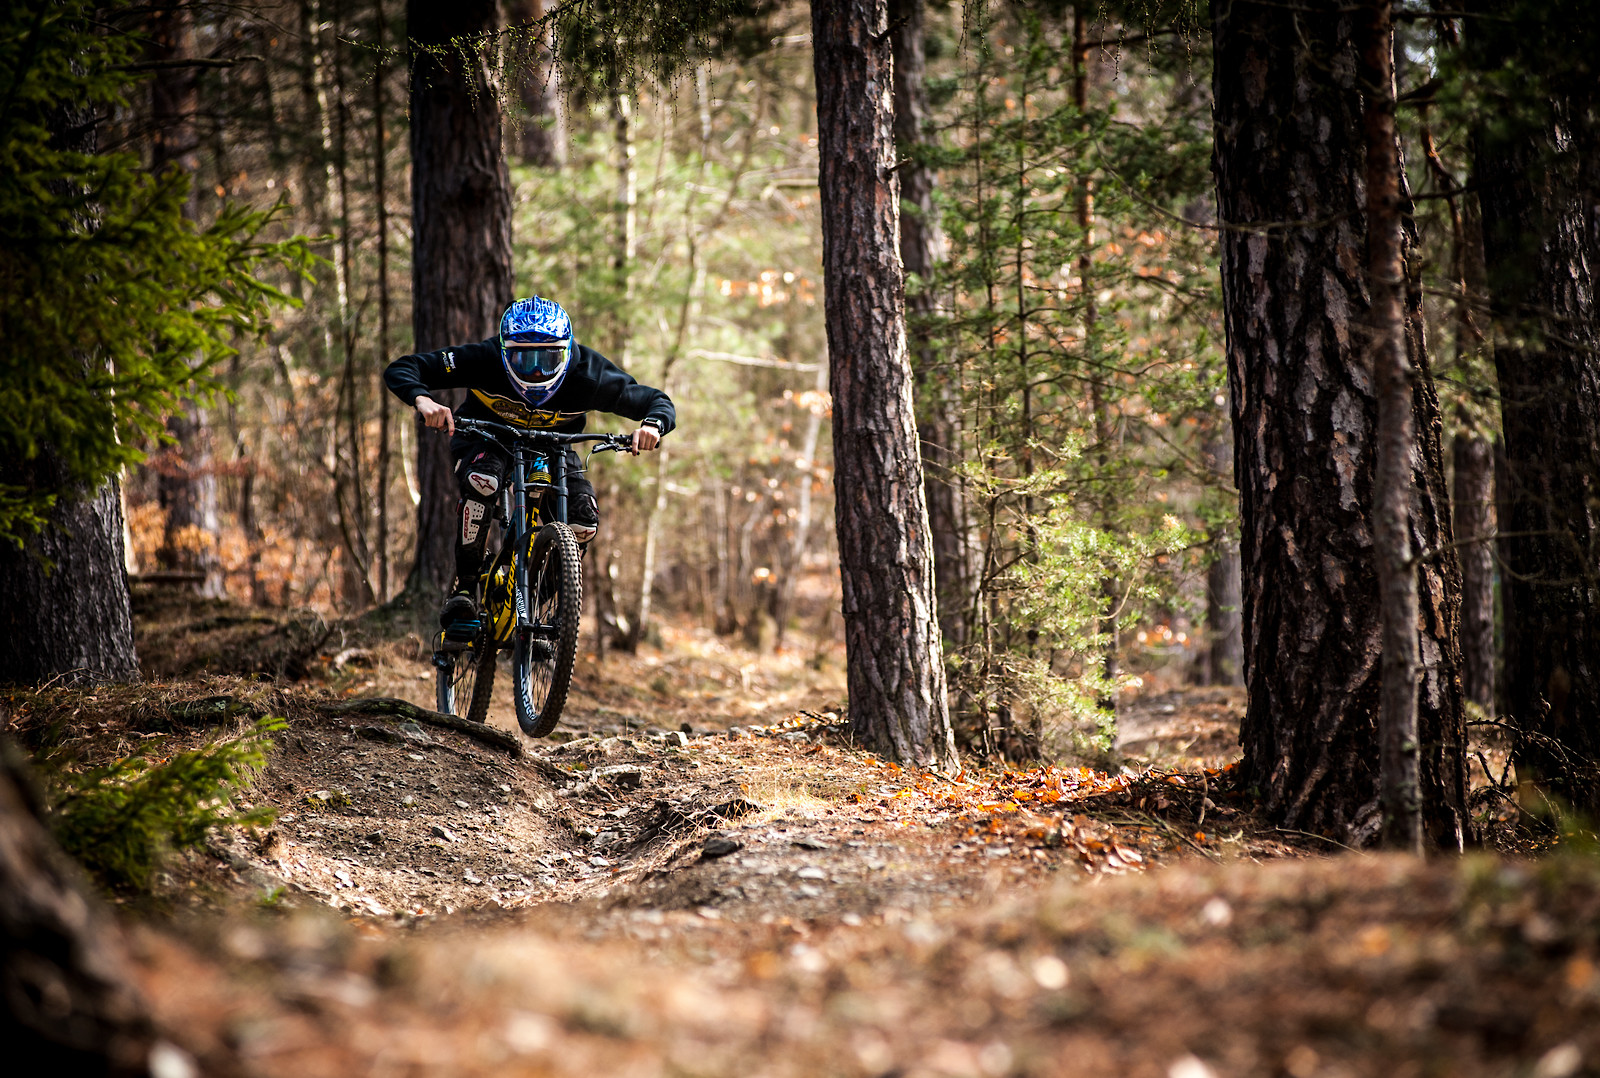 krompachy2019 (1 of 57) - purehell - Mountain Biking Pictures - Vital MTB